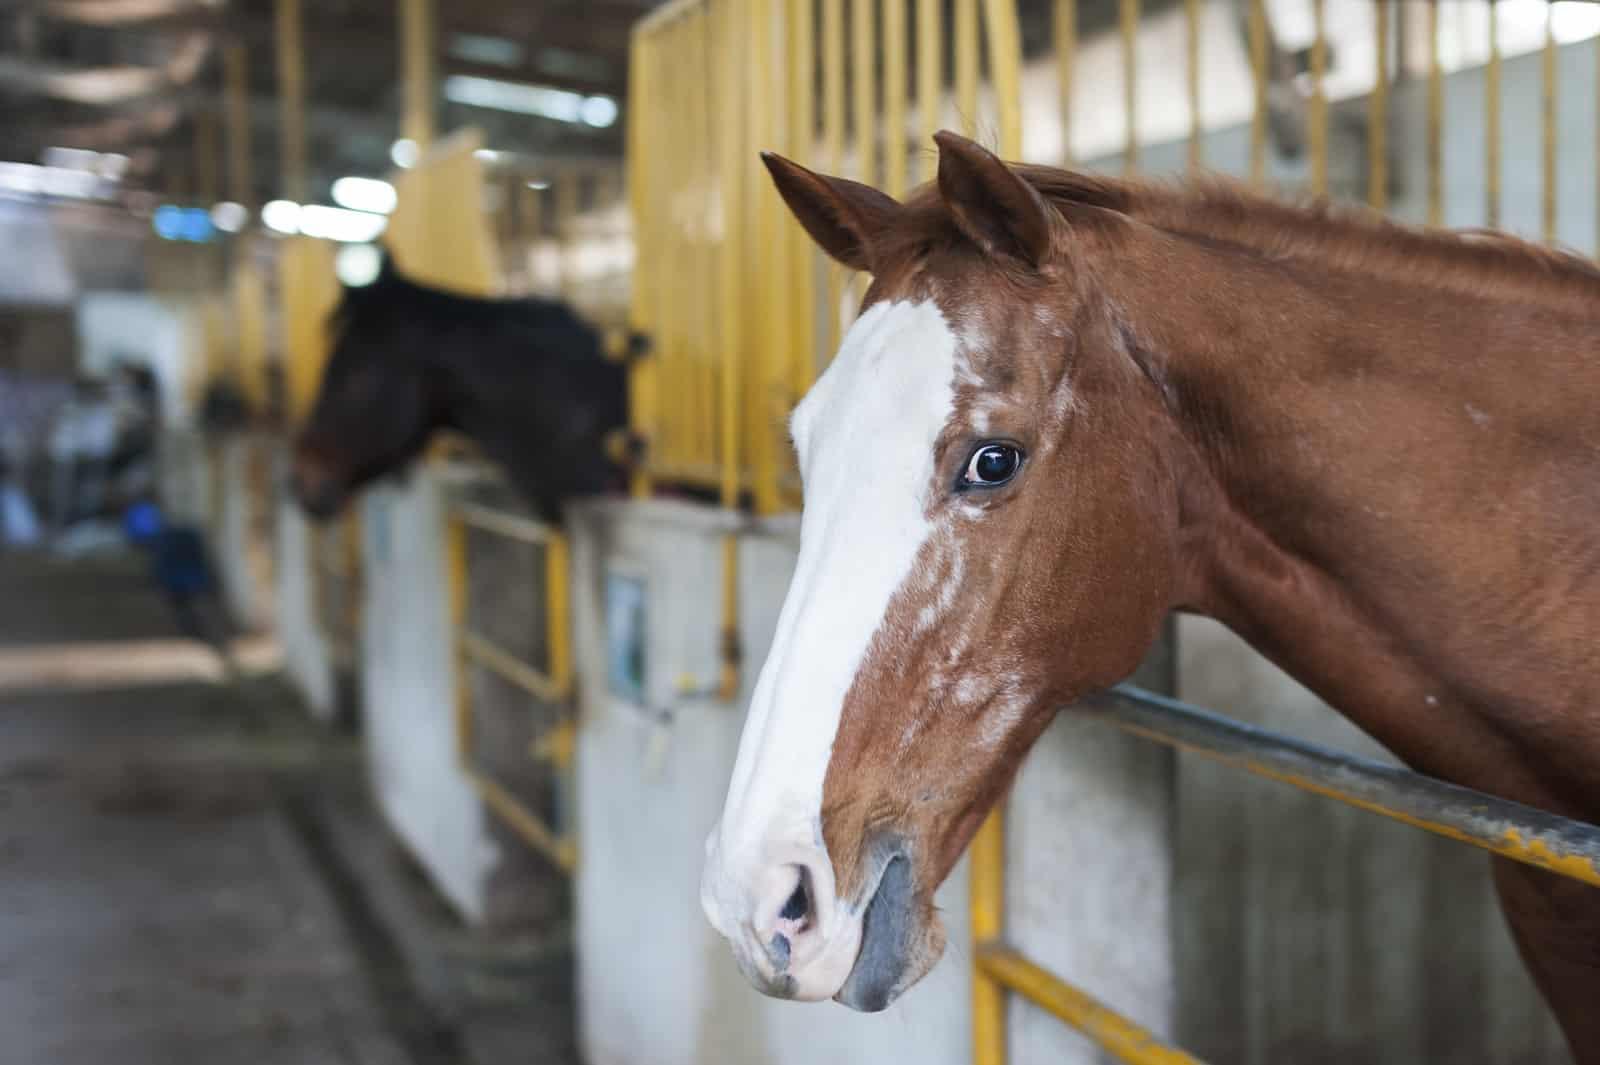 Senior Care at Horse Shows